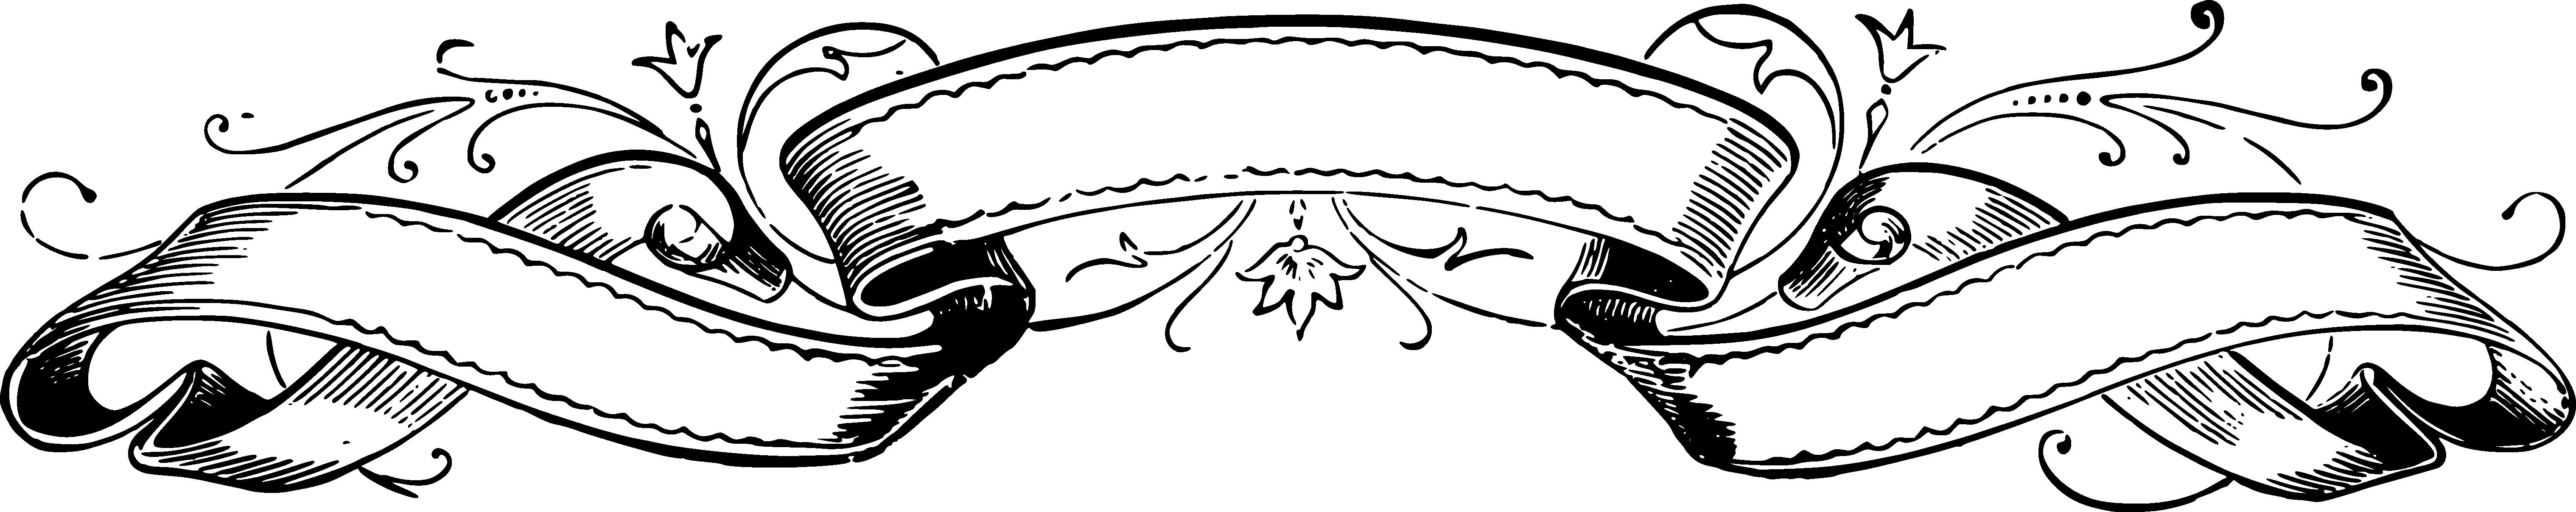 Ribbon Vector Black White Png.